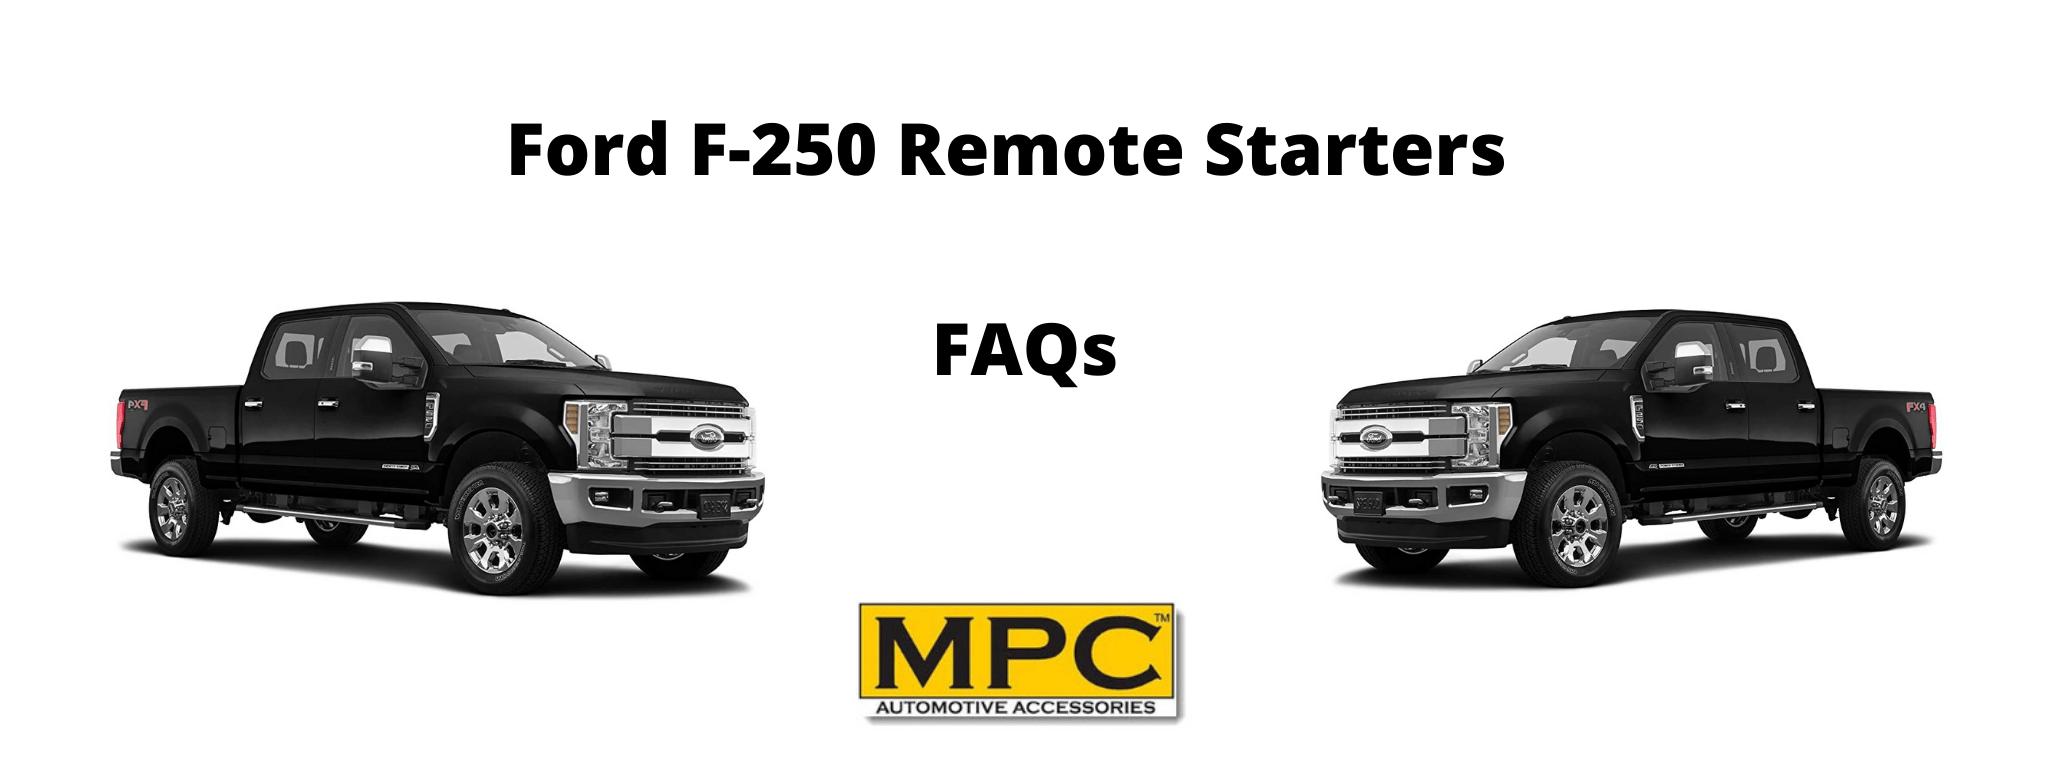 Ford F-250 Remote Start Kit – FAQs